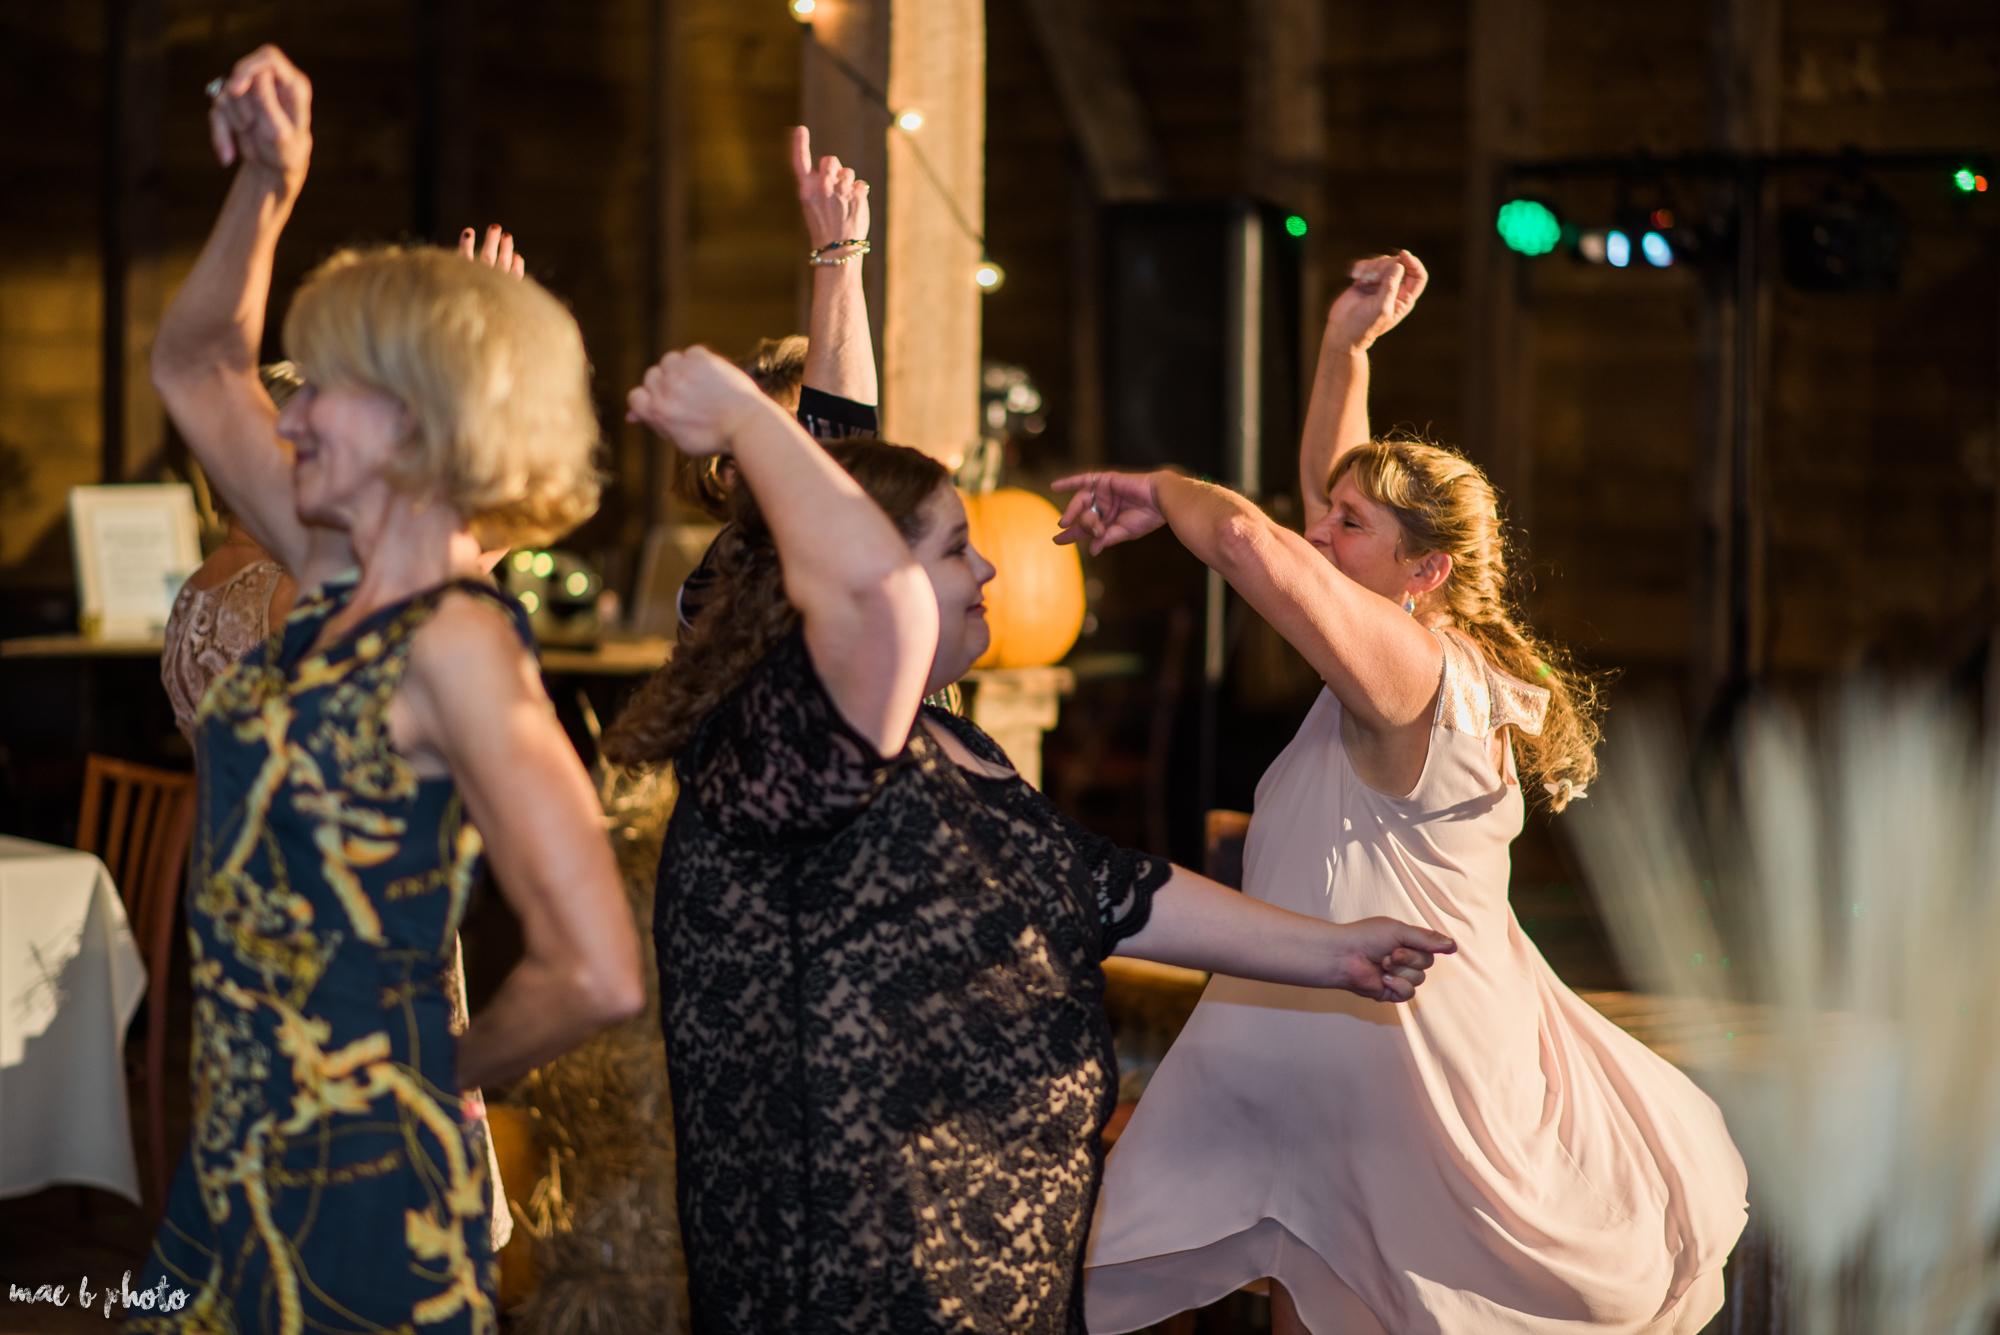 Sarah & Dustin's Rustic Chic Barn Wedding at Hartford Hill Winery in Hartford, Ohio by Mae B Photo-116.jpg